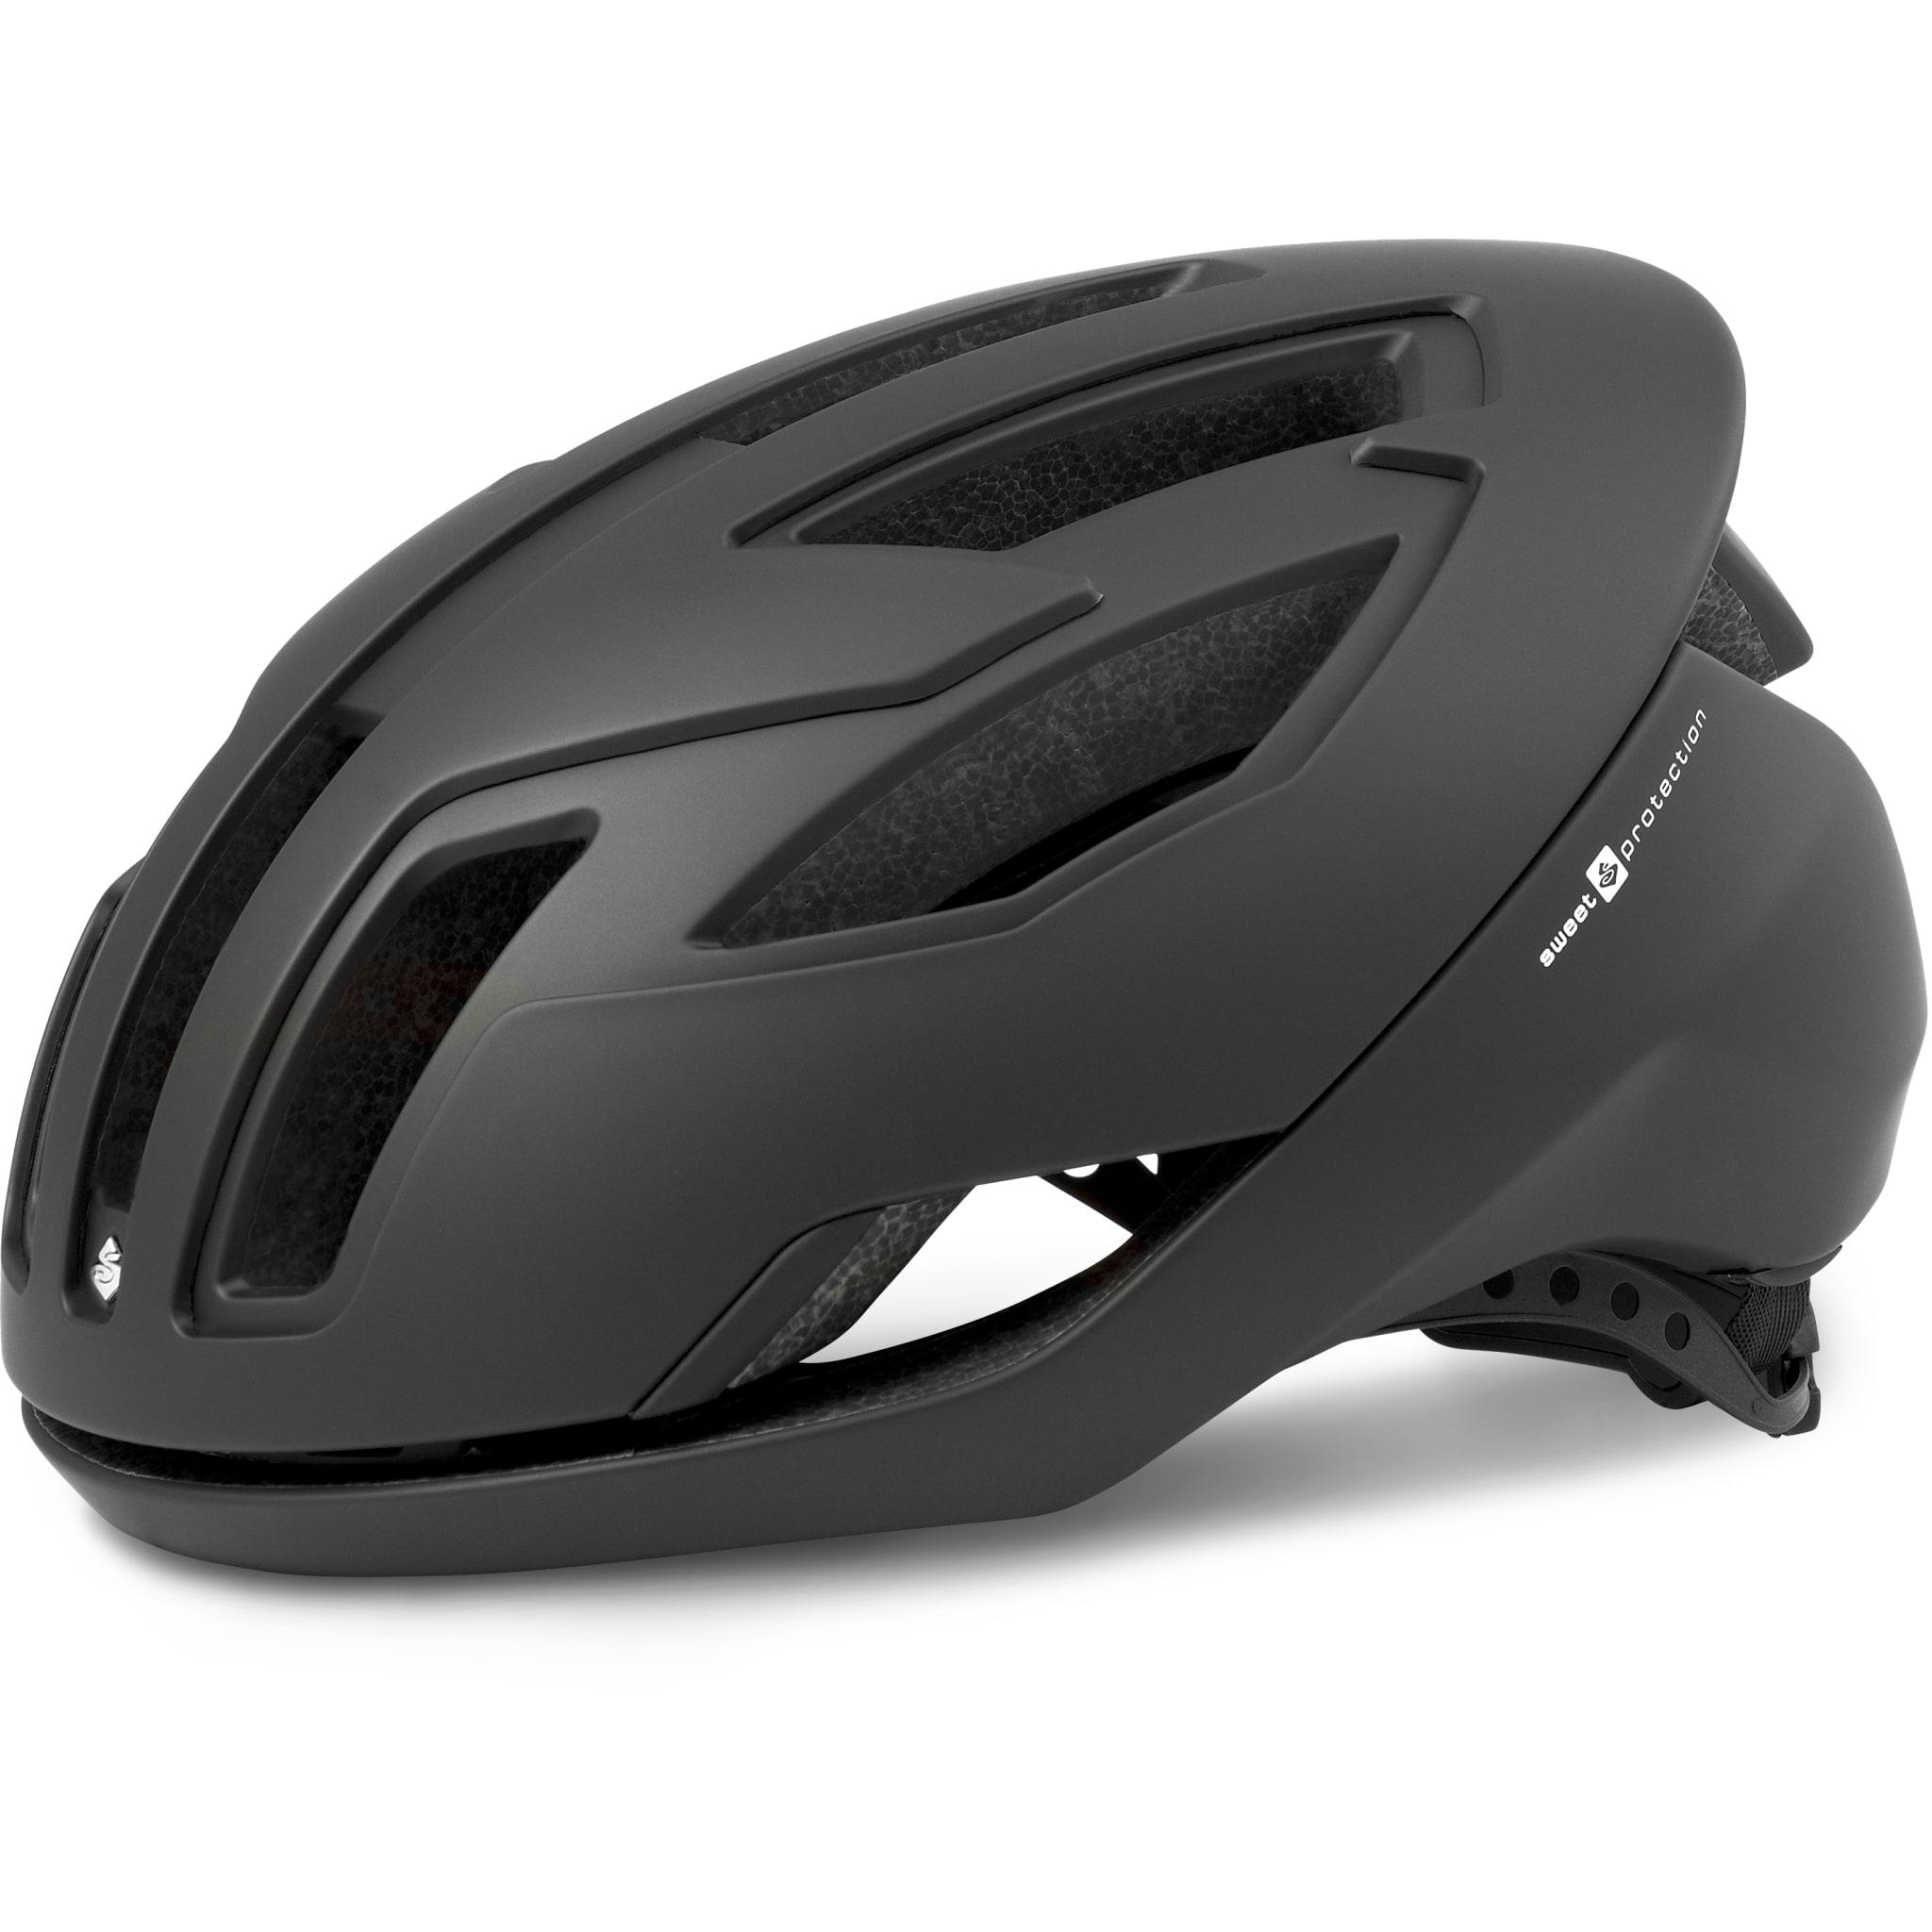 Falconer Helmet